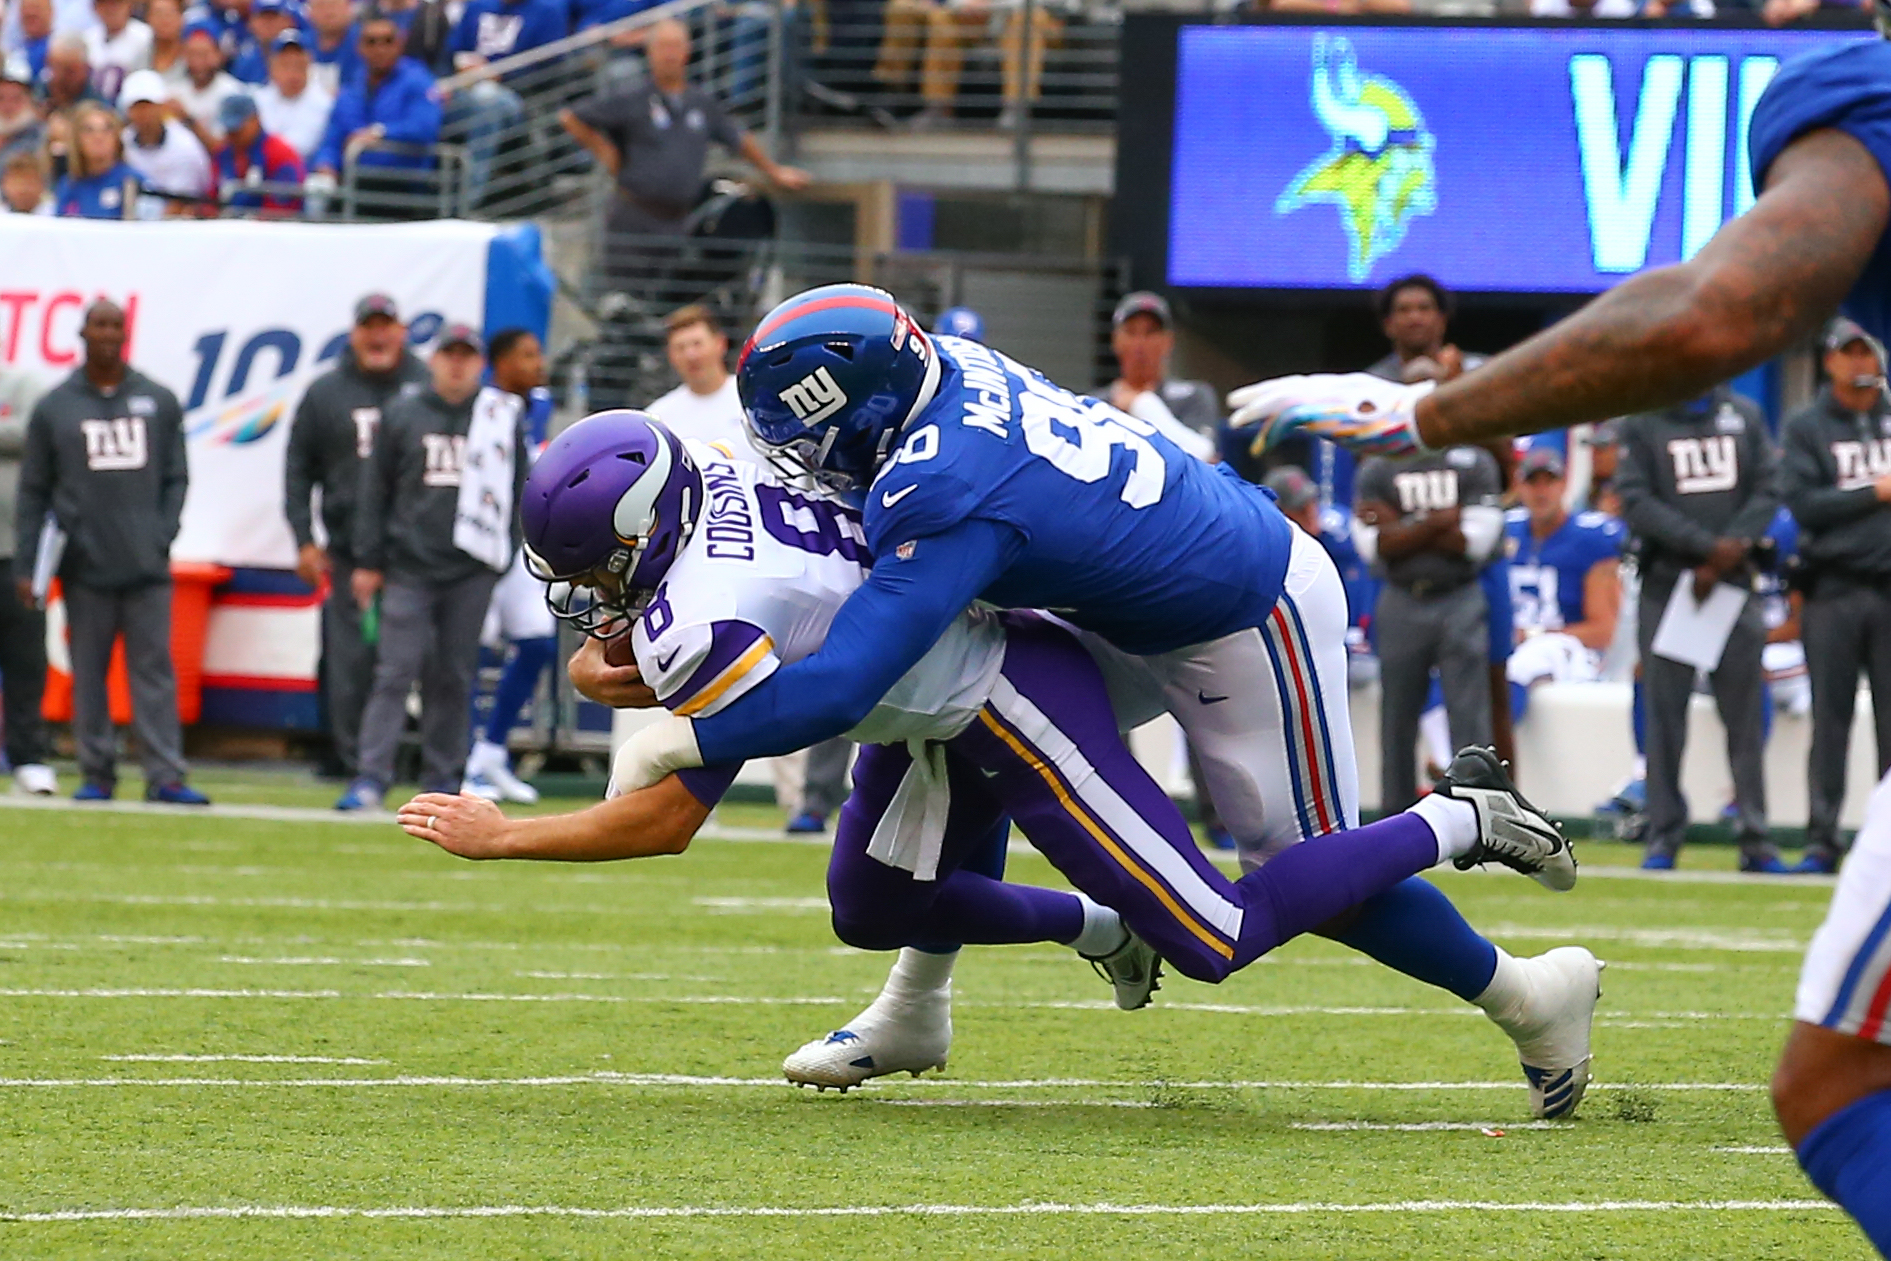 NFL: OCT 06 Vikings at Giants